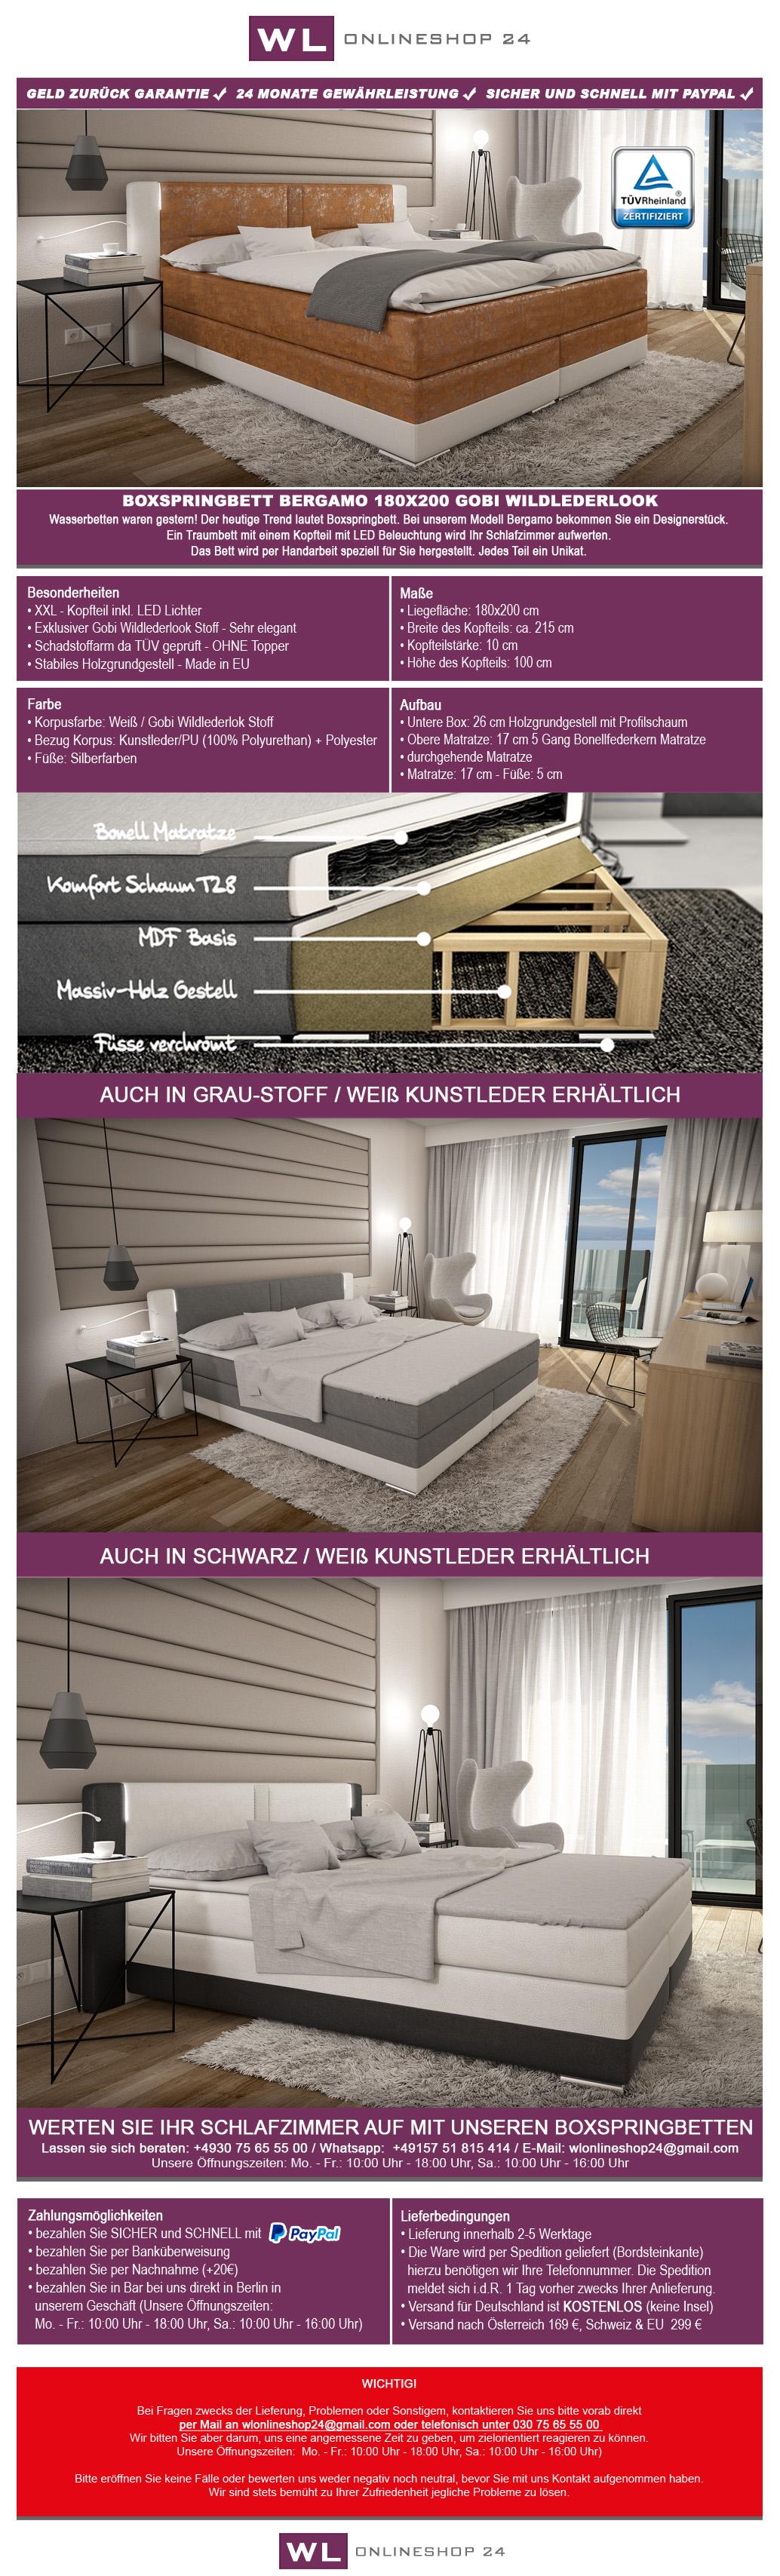 boxspringbett 180x200 wei hotelbett led polsterbett bett sofort lieferbar ebay. Black Bedroom Furniture Sets. Home Design Ideas